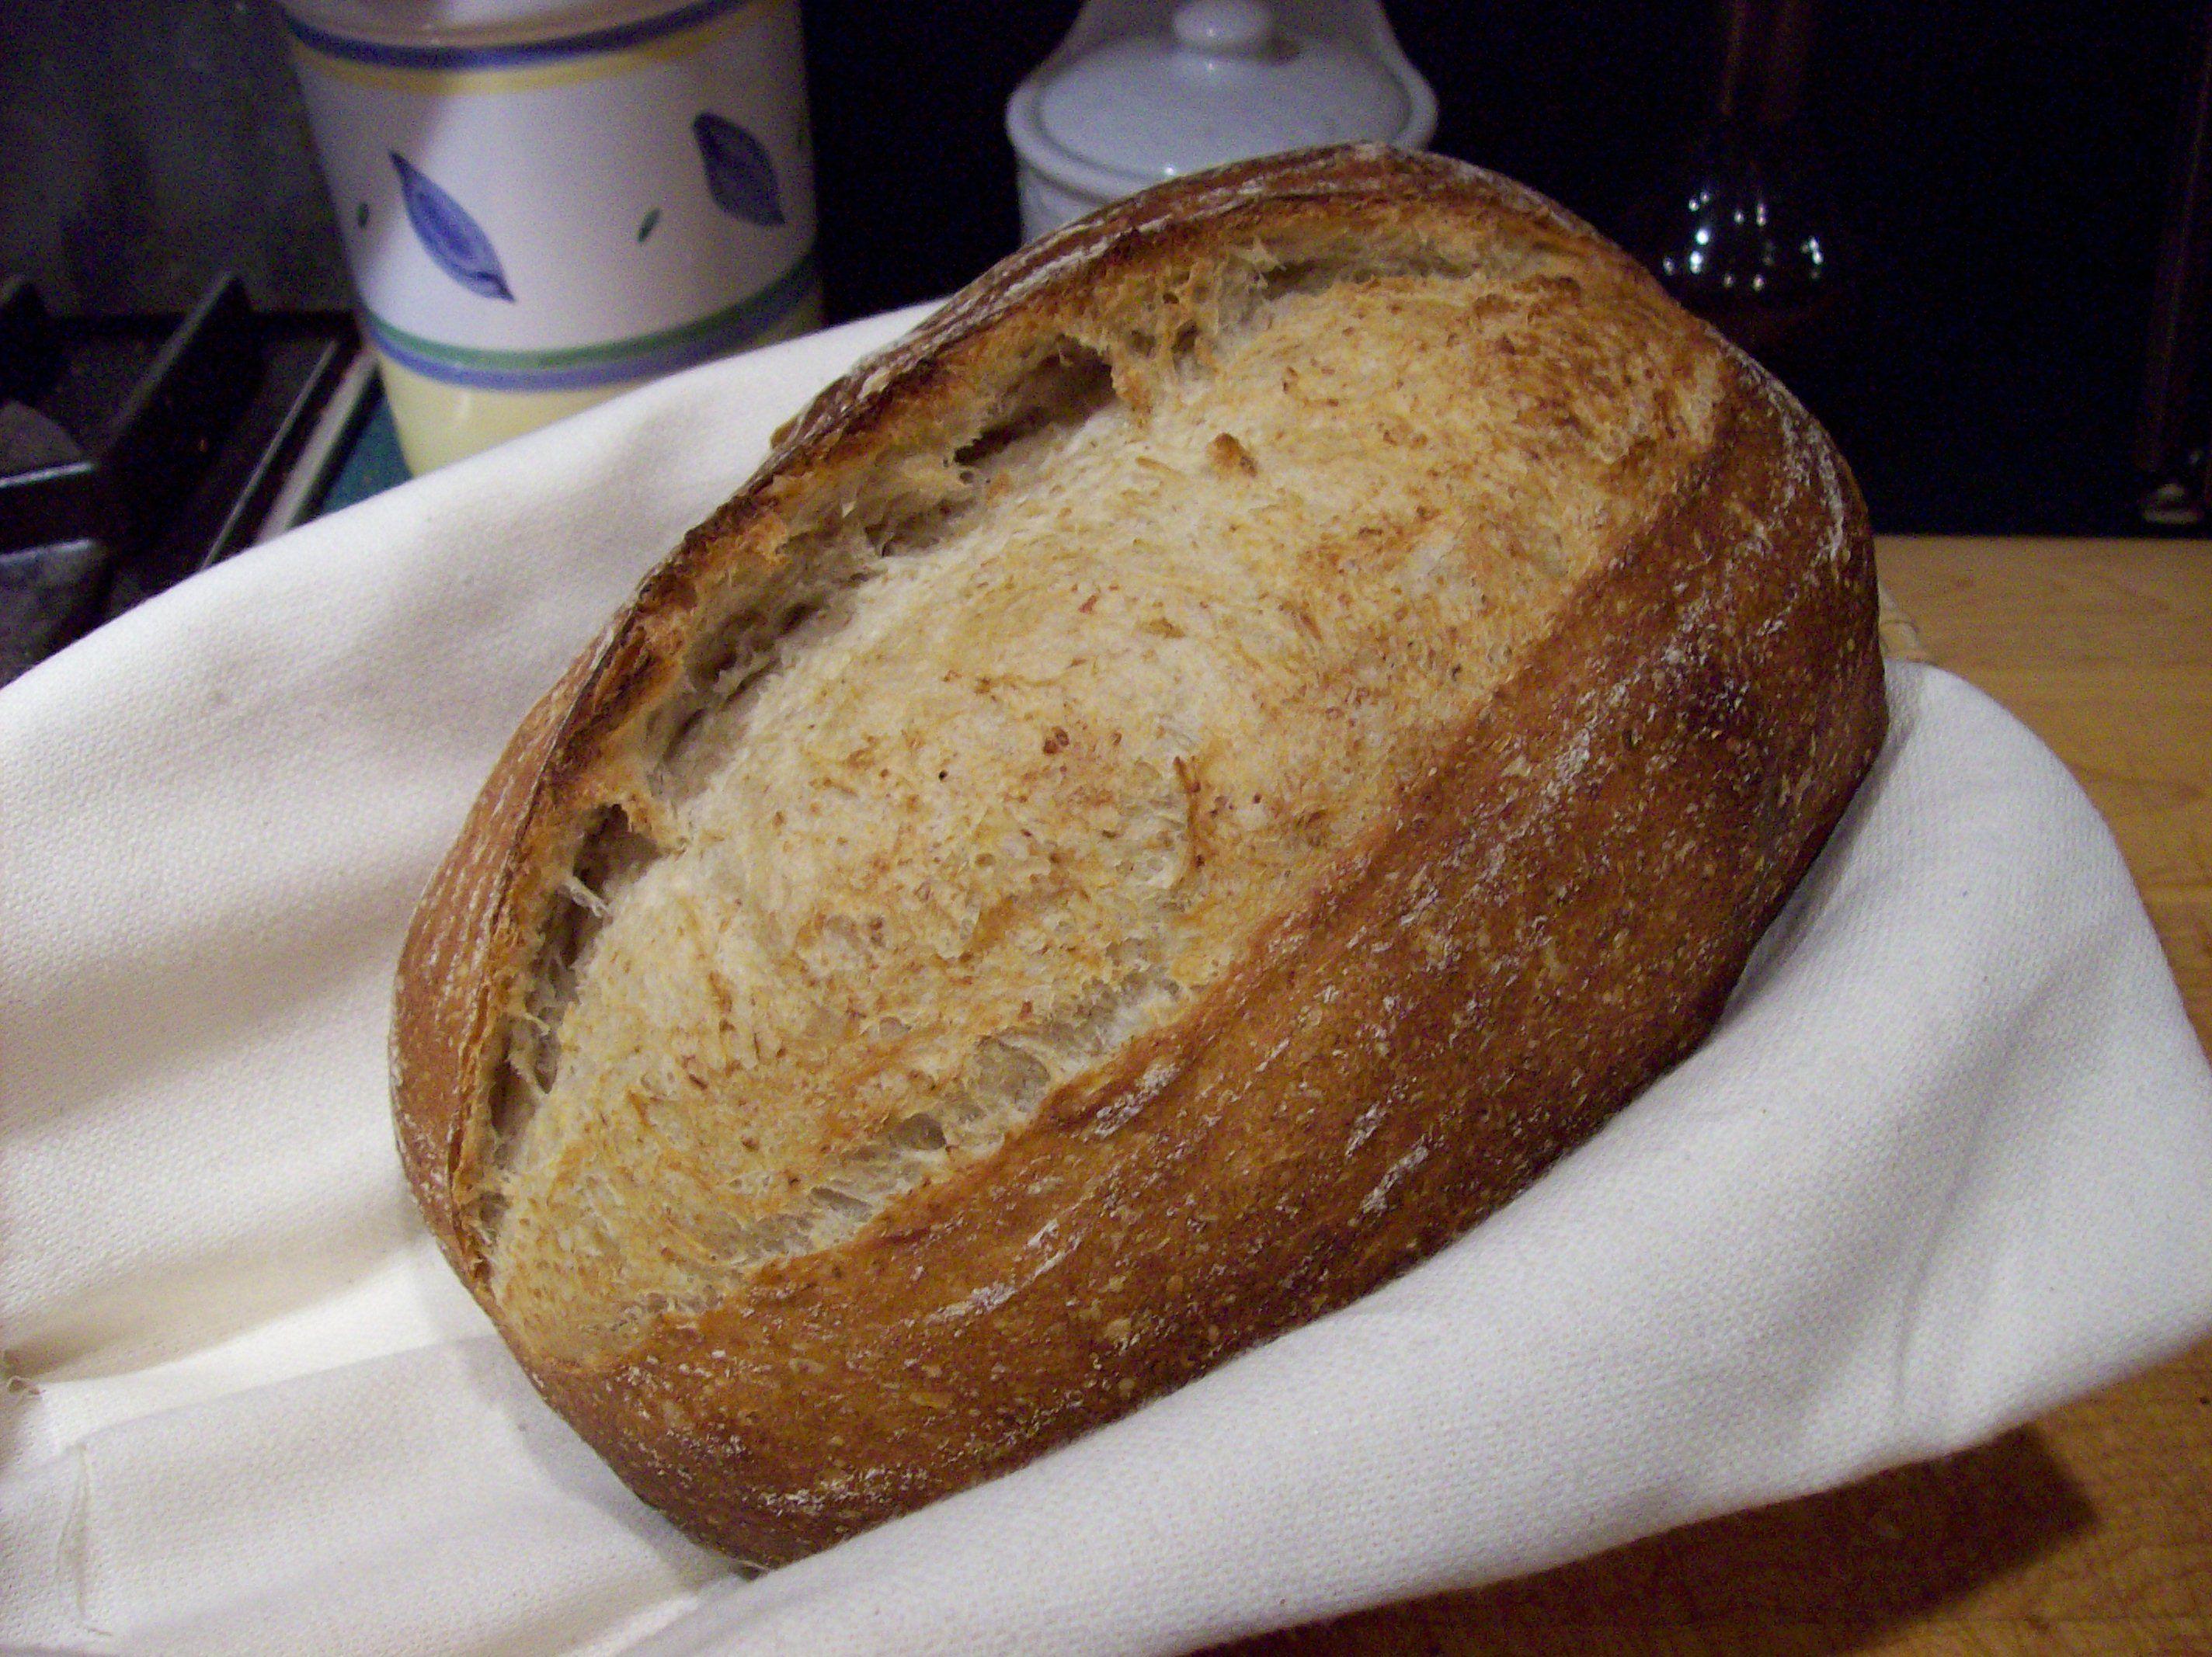 Pain Au Levain Sourdough Bread Uses Ap And Medium Rye